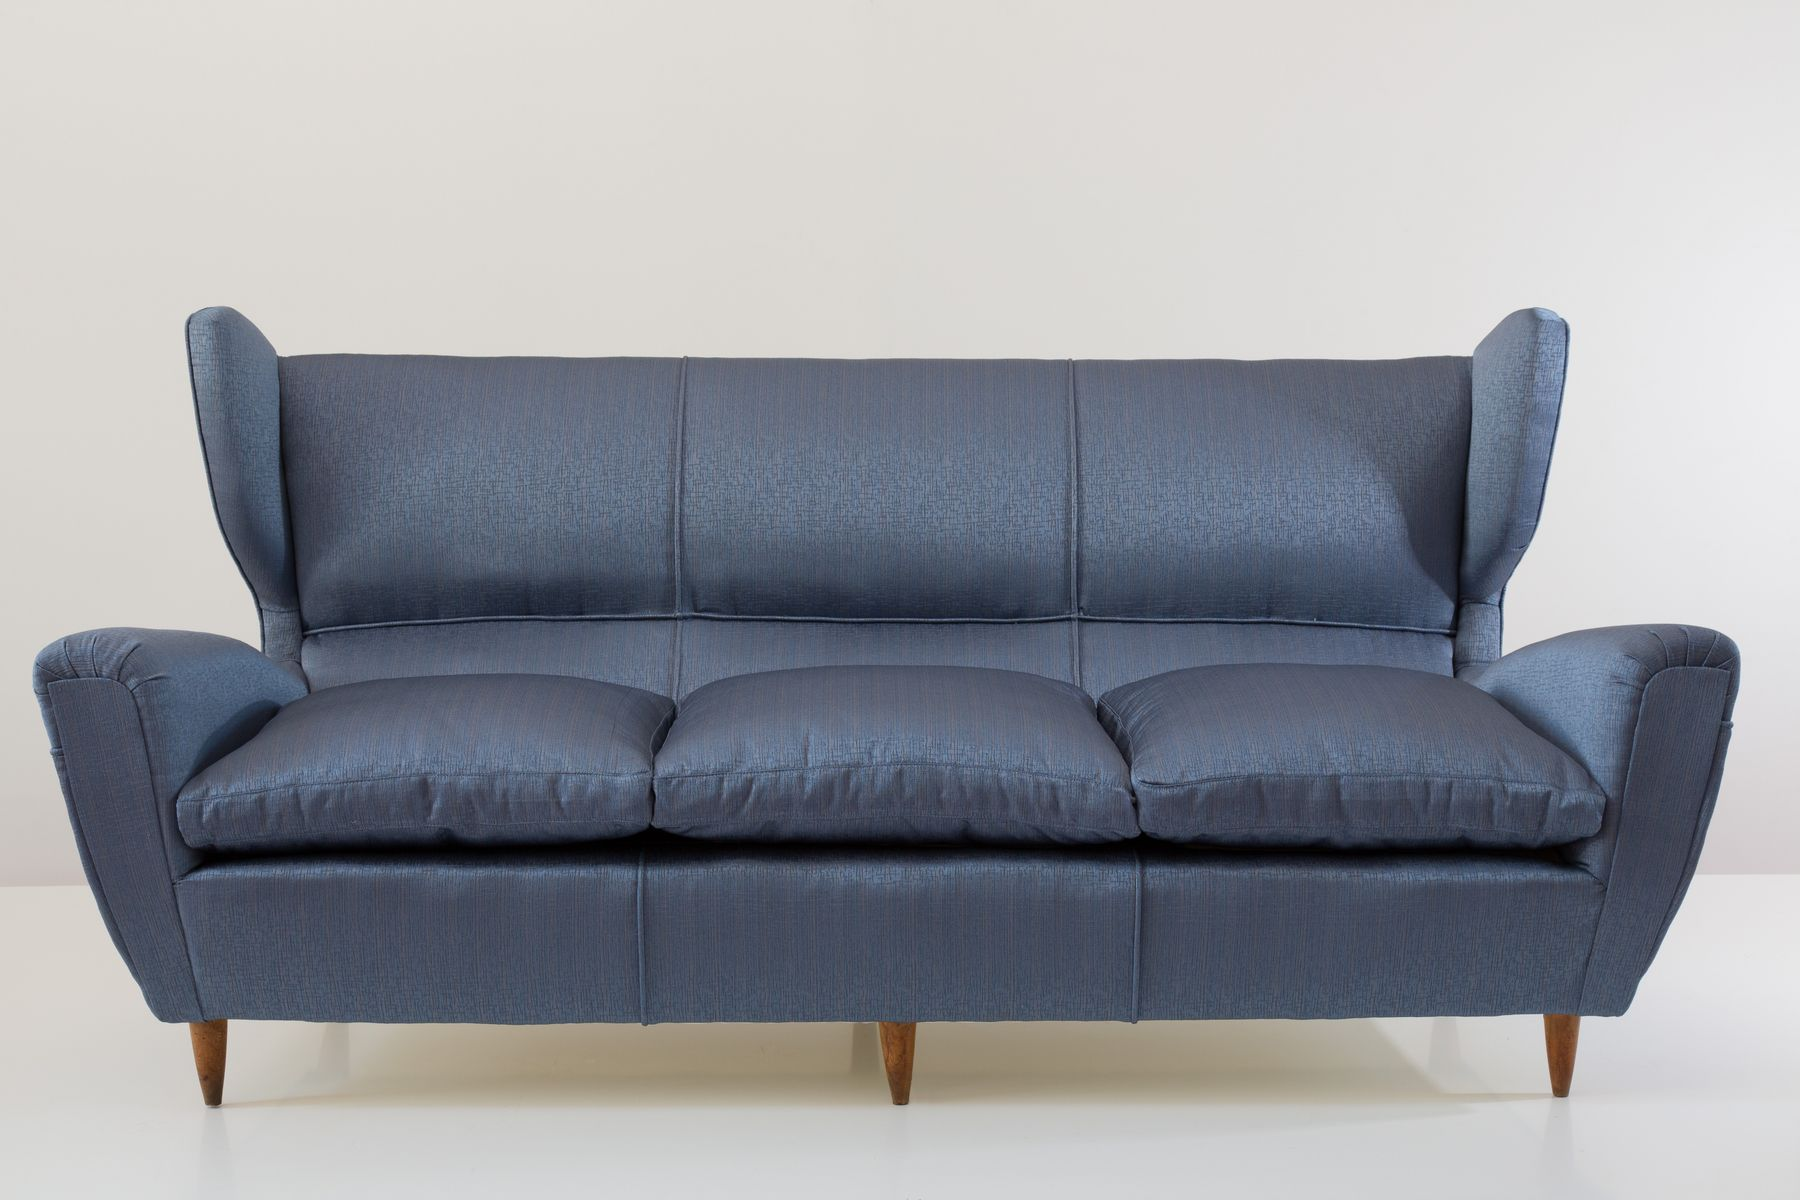 Drei sitzer ohrensessel sofa von paolo buffa bei pamono kaufen for Ohrensessel sofa